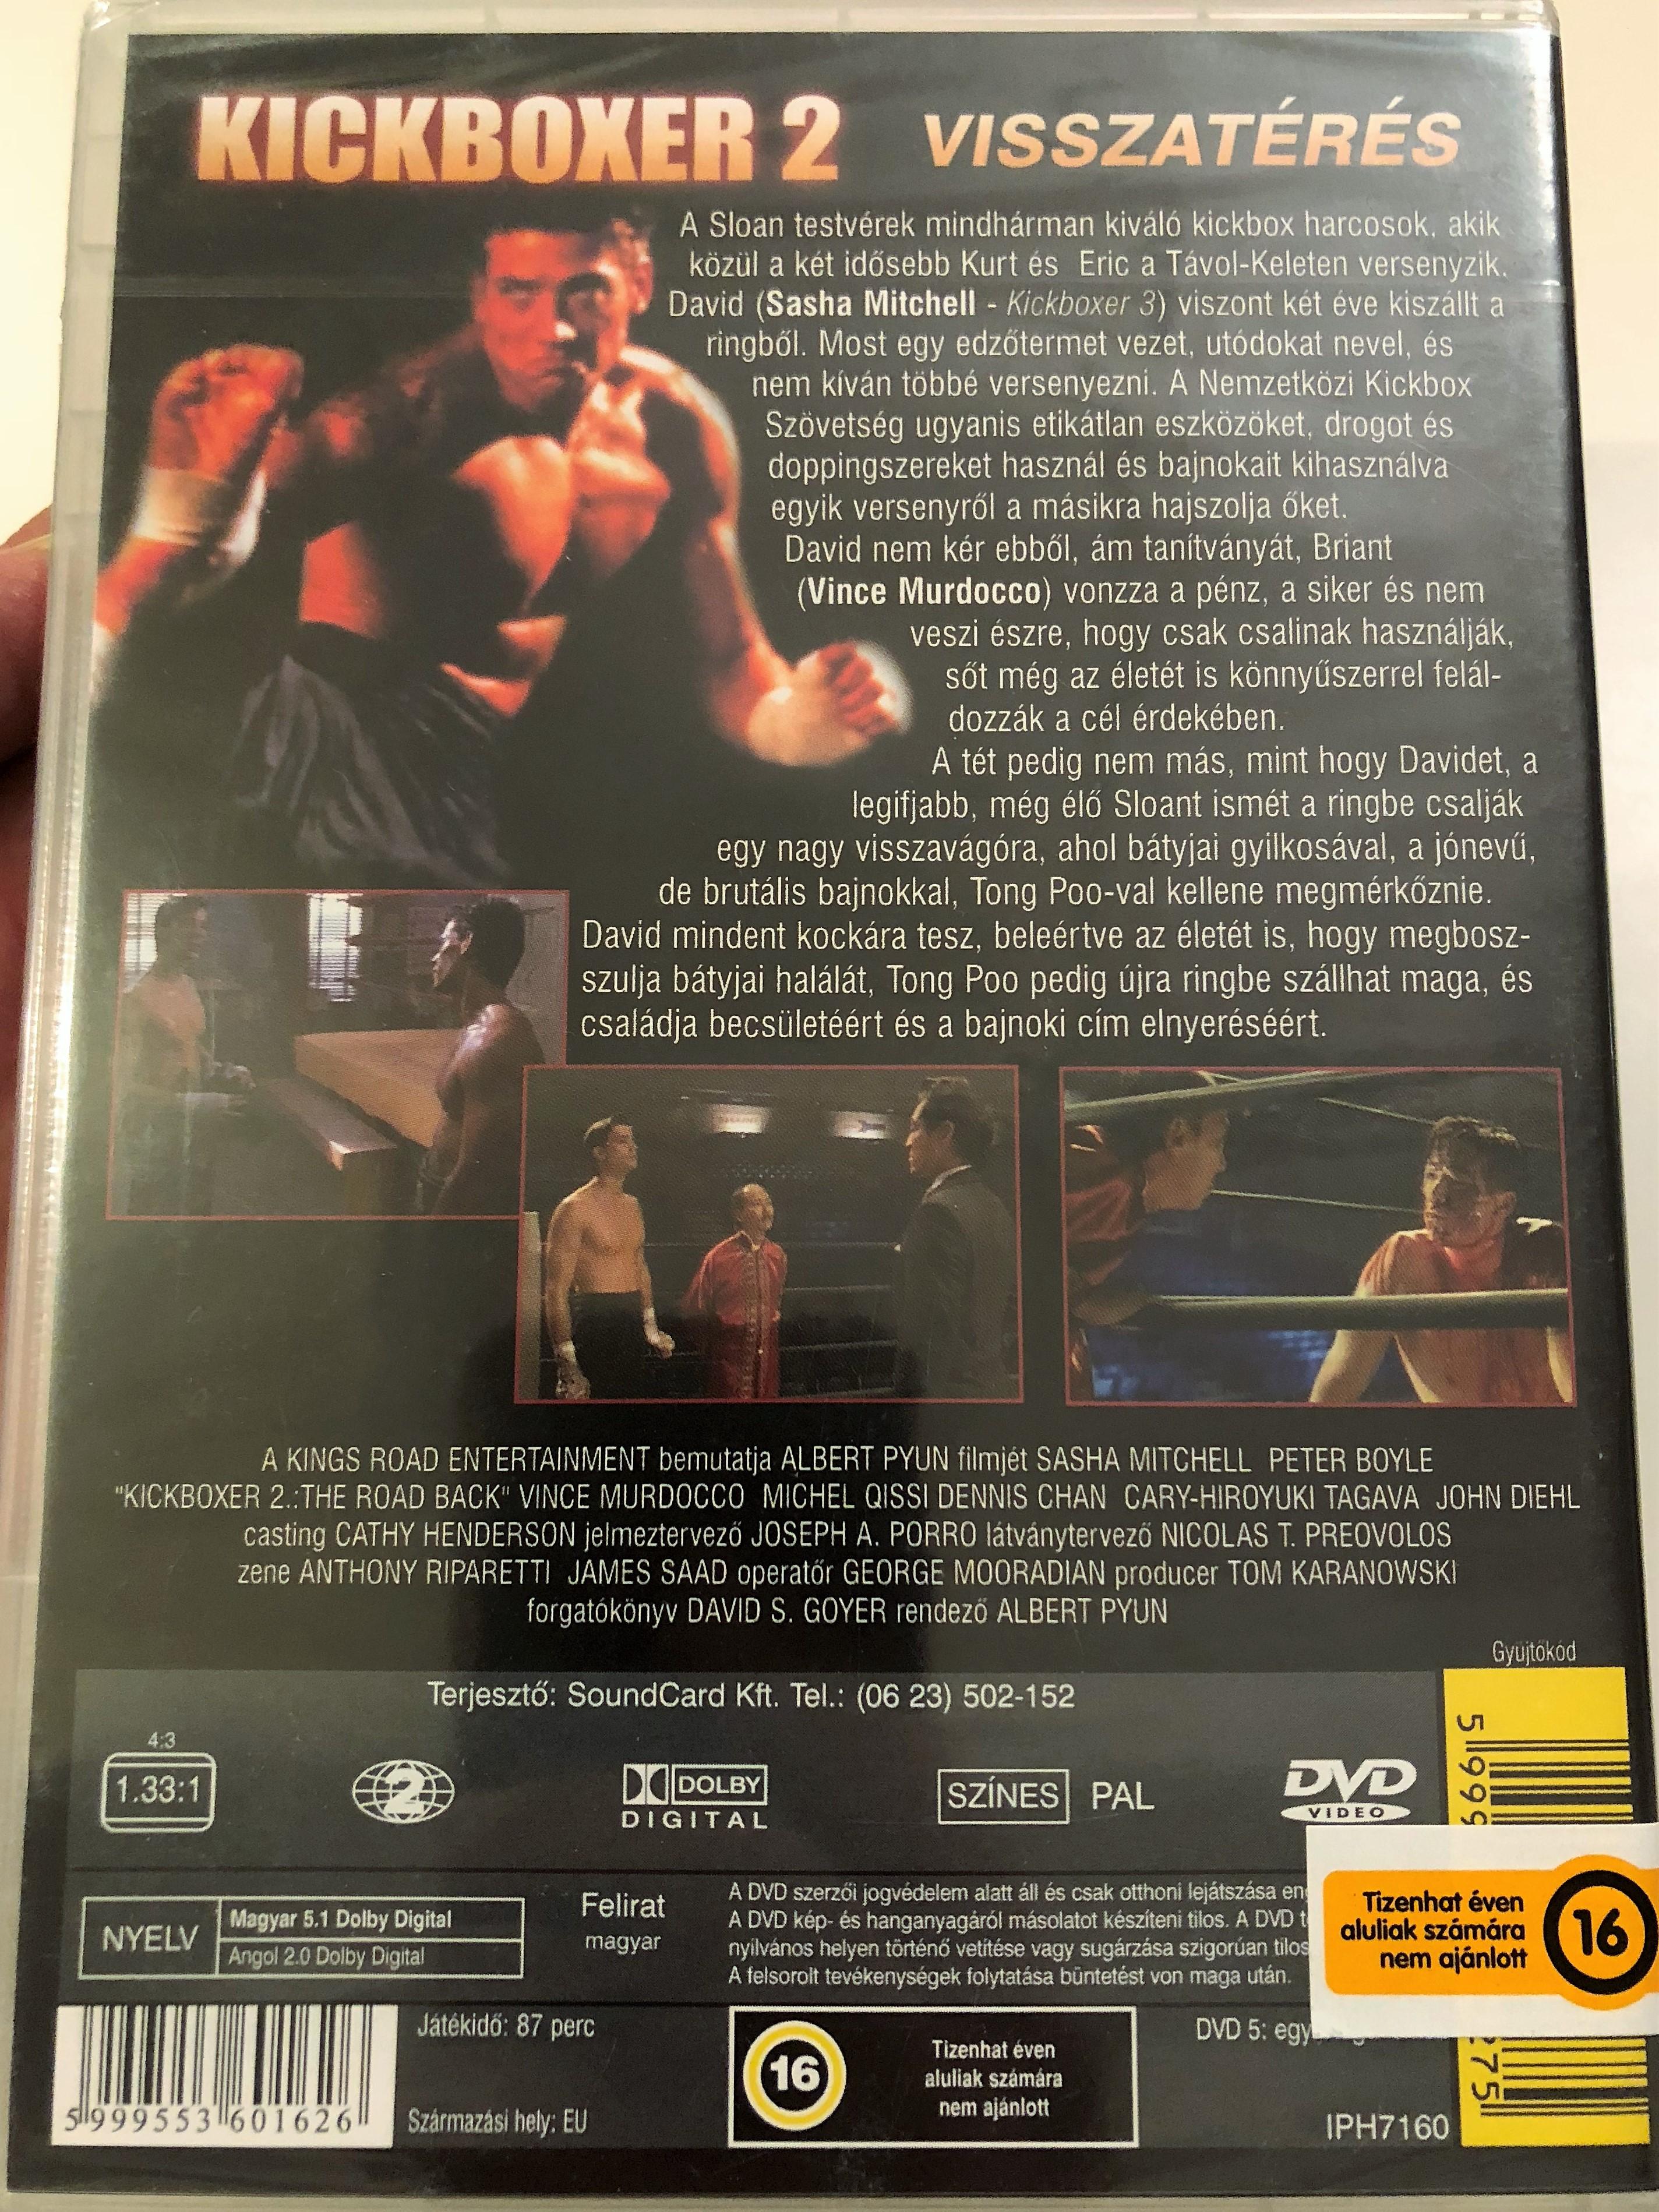 kickboxer-2-the-road-back-dvd-1991-kickboxer-2-visszat-r-s-directed-by-albert-pyun-starring-sasha-mitchell-peter-boyle-dennis-chan-cary-hiroyuki-tagawa-john-diehl-michel-qissi-2-.jpg